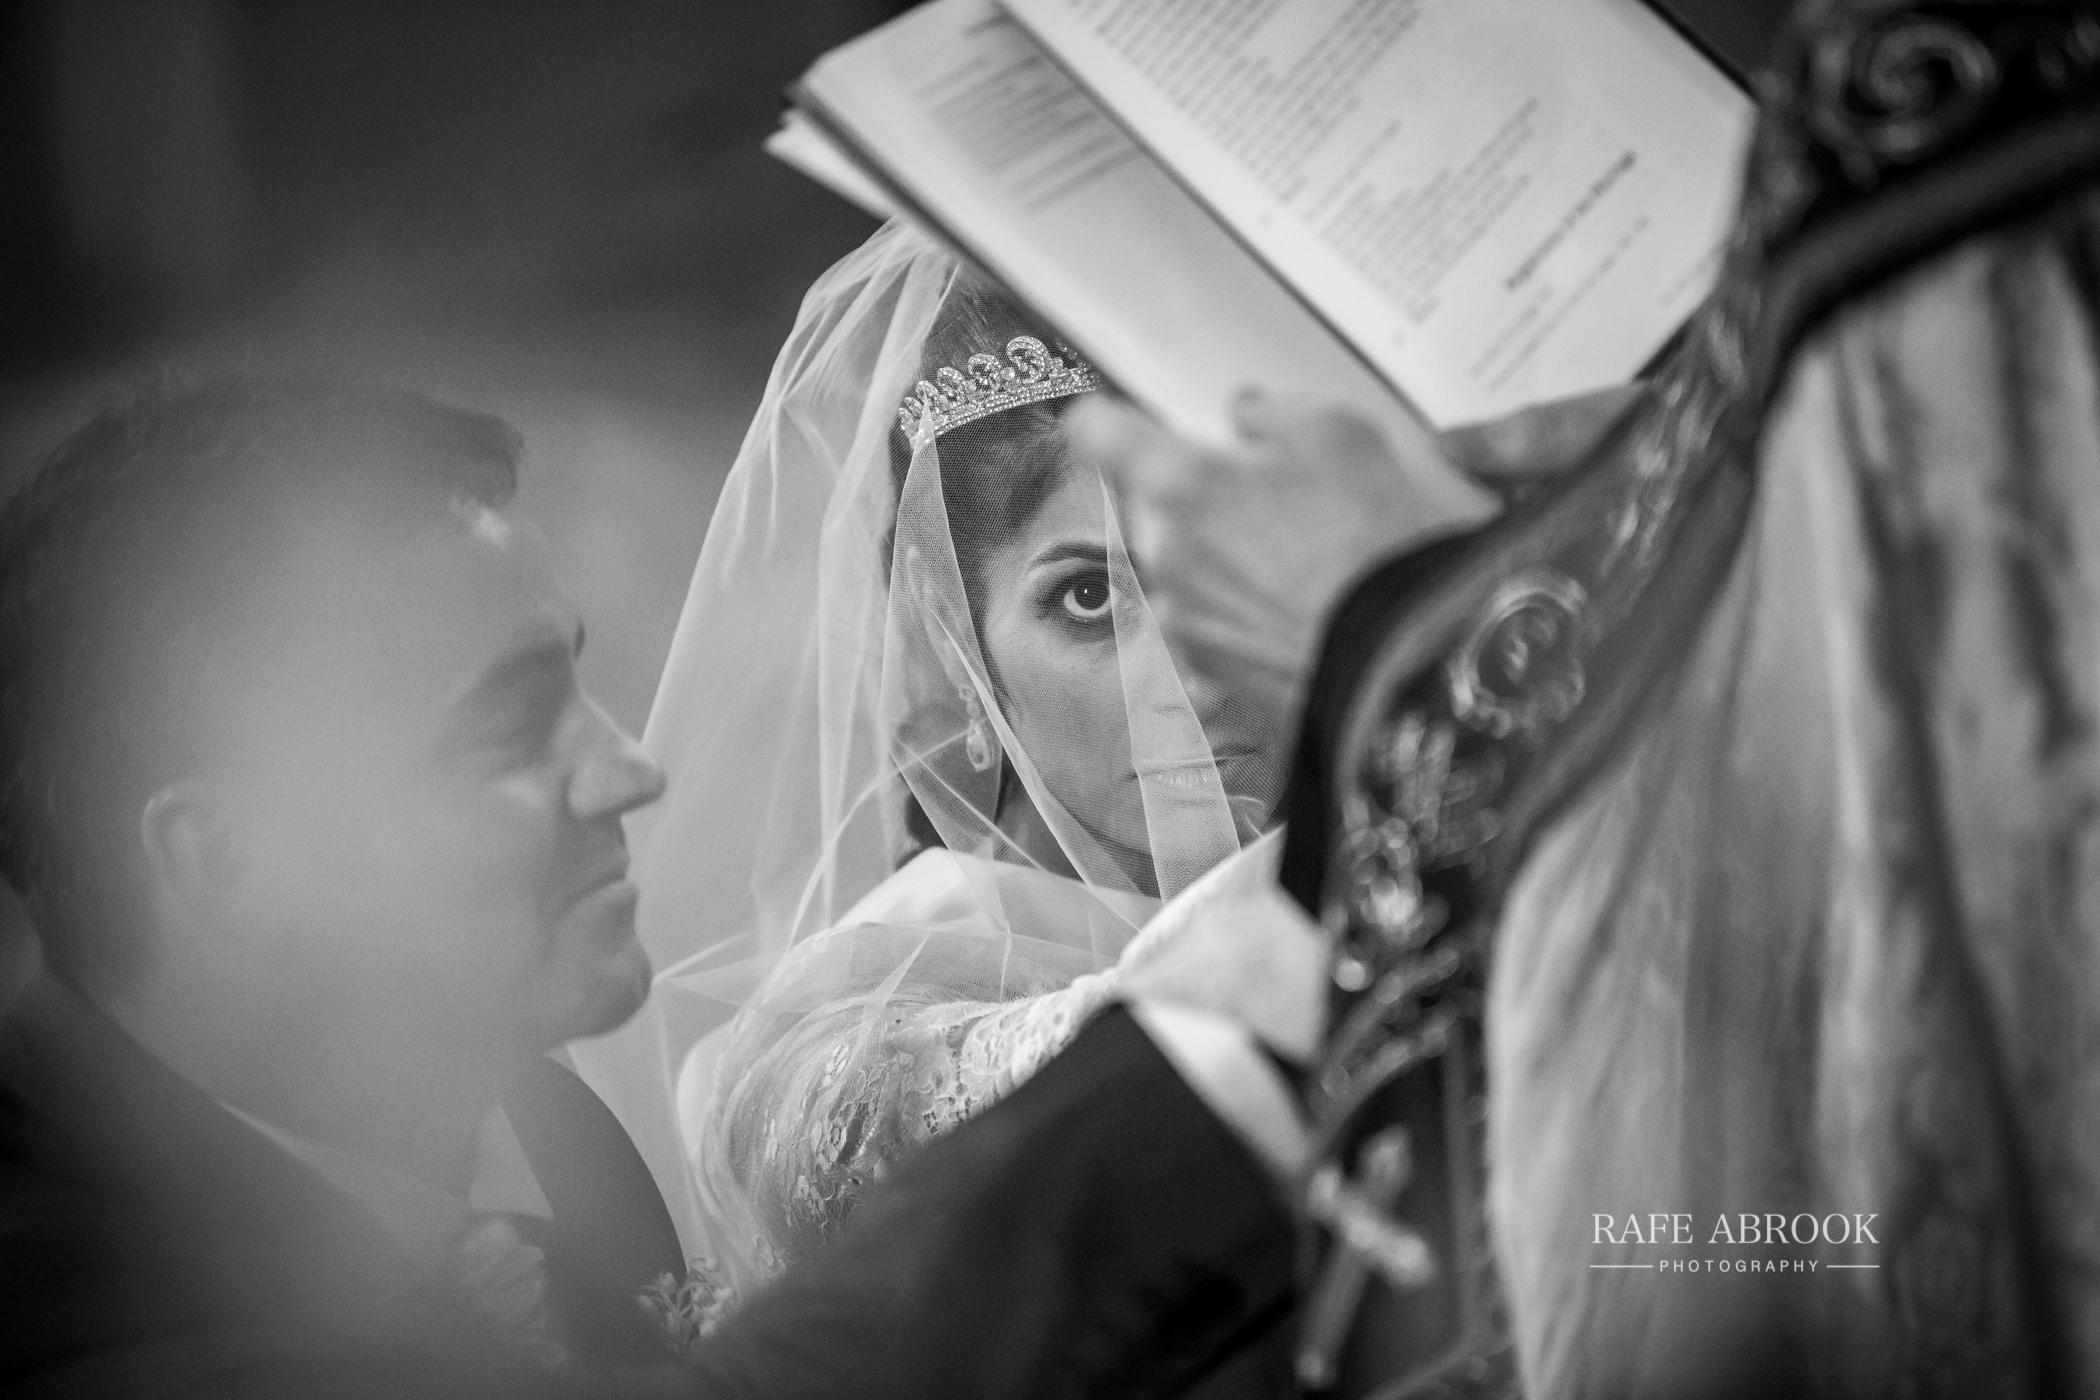 roma & pete wedding hampstead shenley hertfordshire -205.jpg